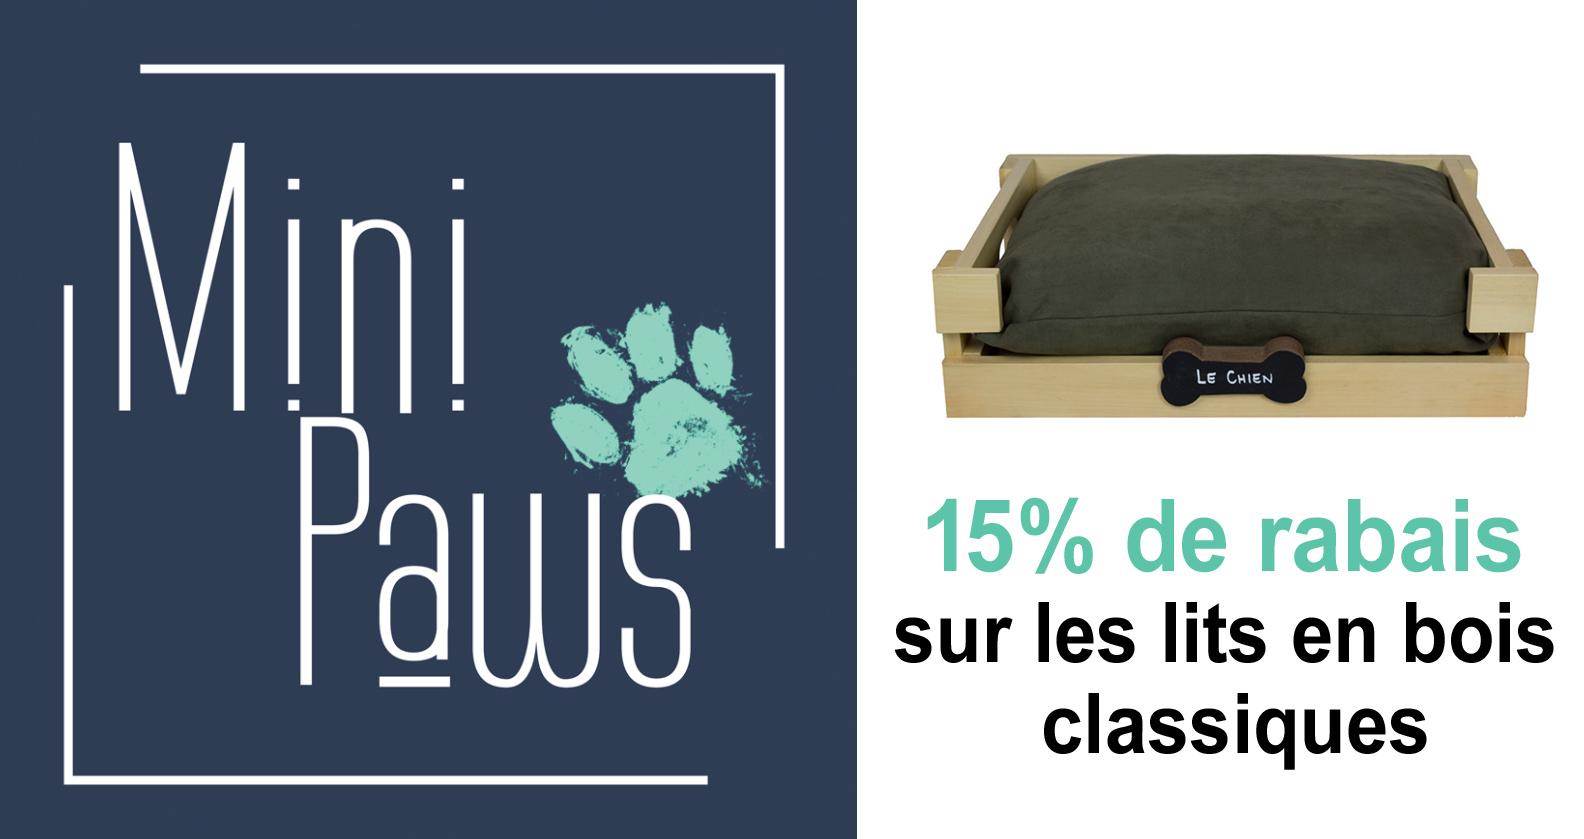 Mini Paws lits pour animaux